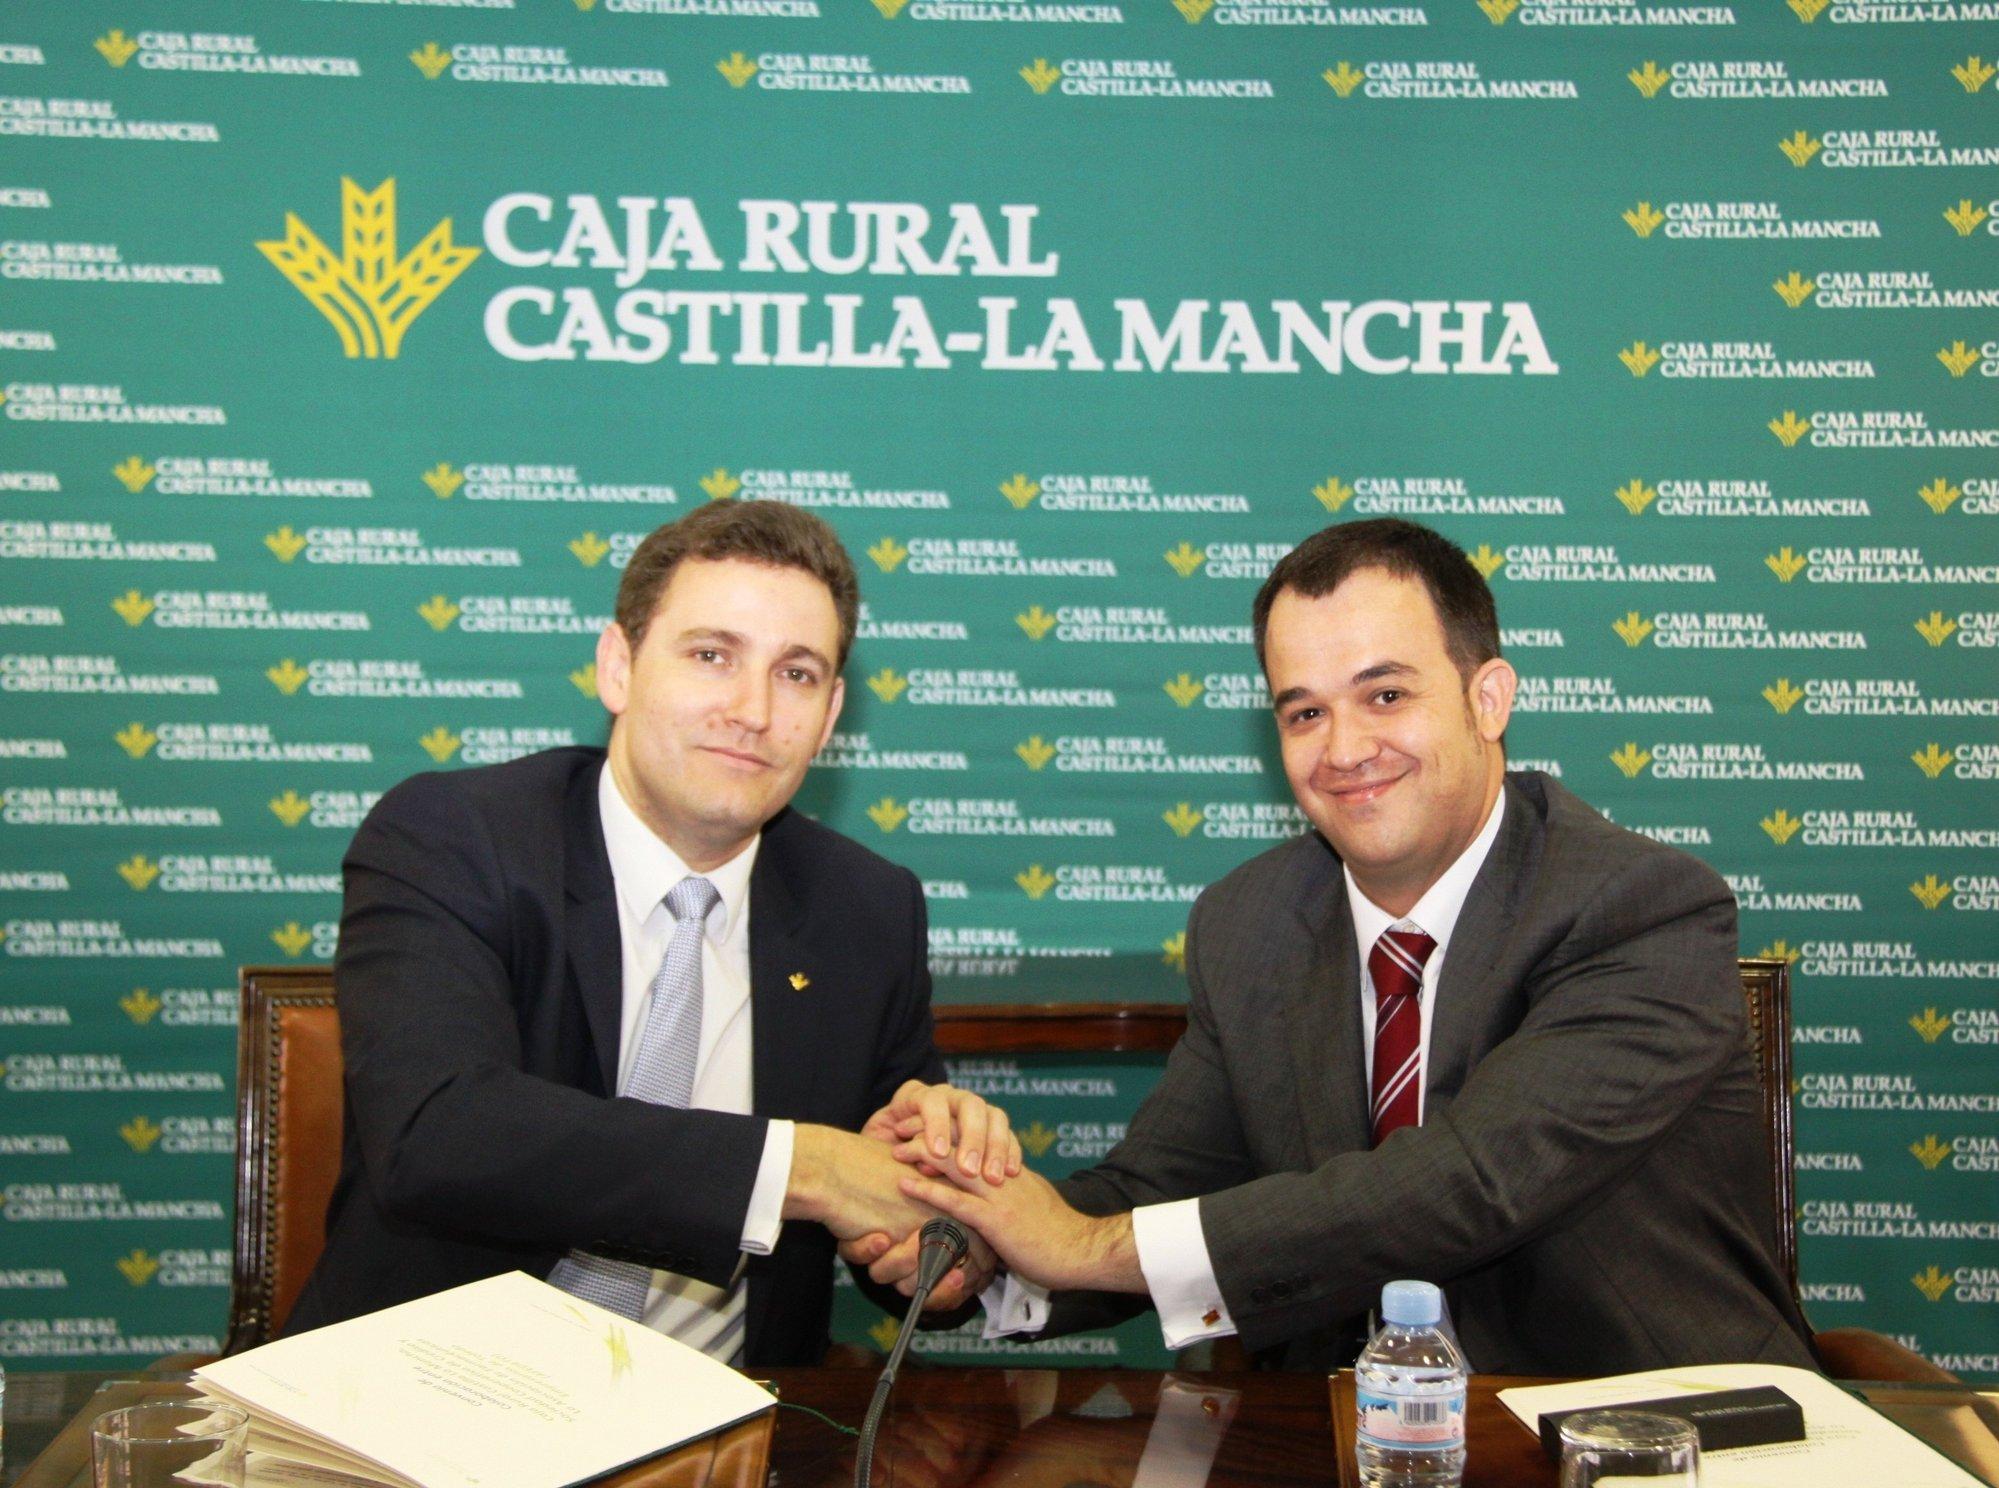 Caja Rural Castilla-La Mancha habilita 30 millones de liquidez para los empresarios farmacéuticos de Toledo